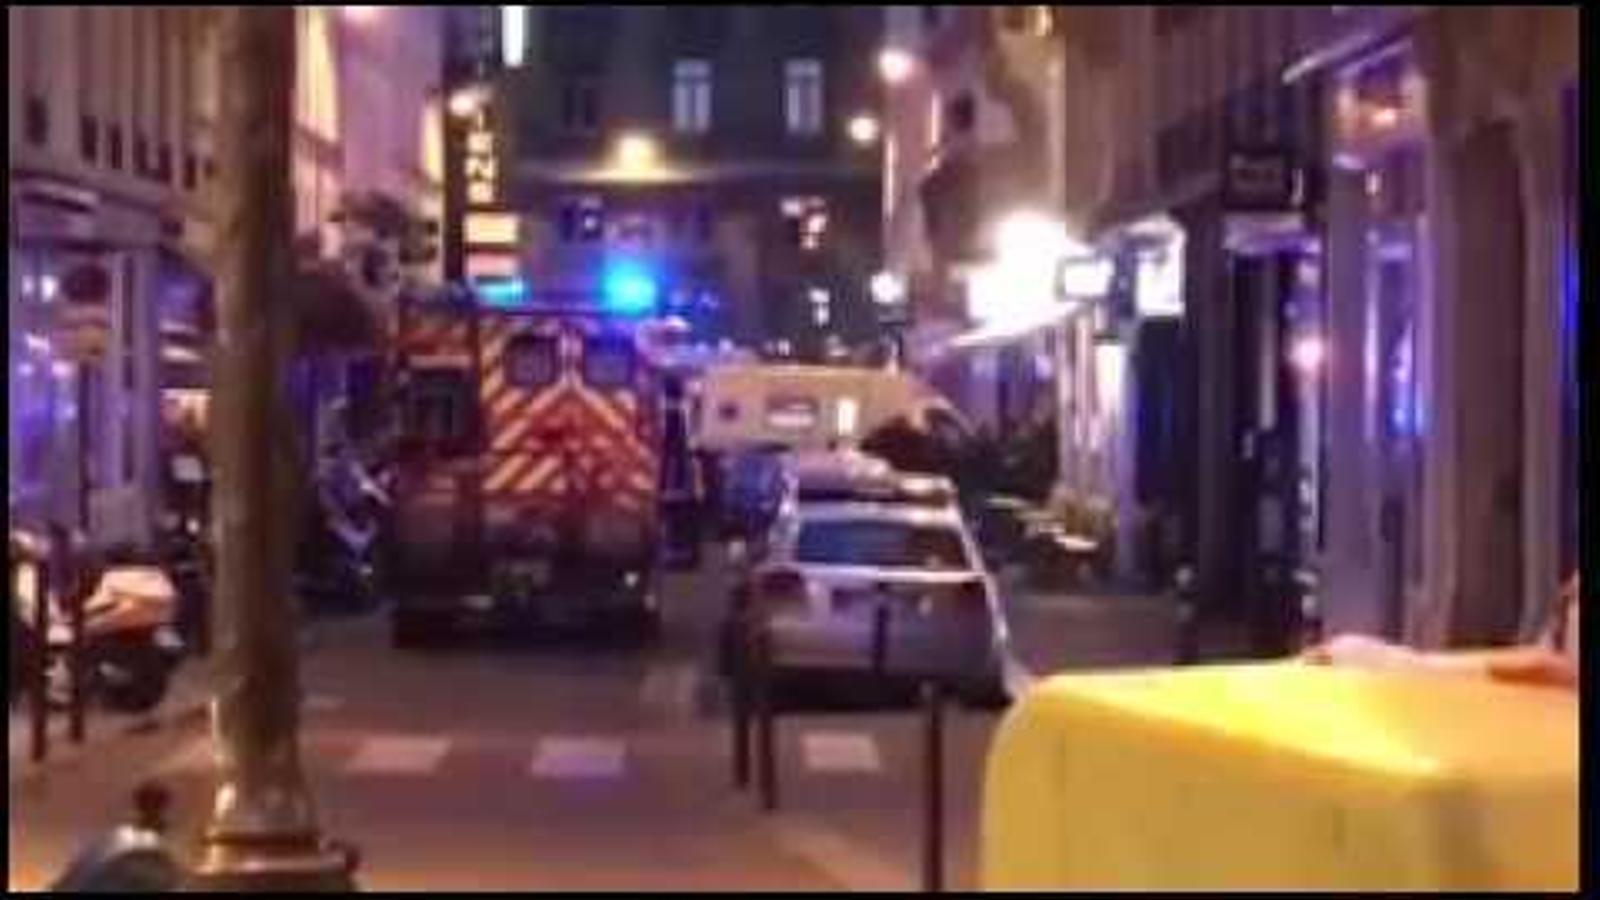 Atac a París